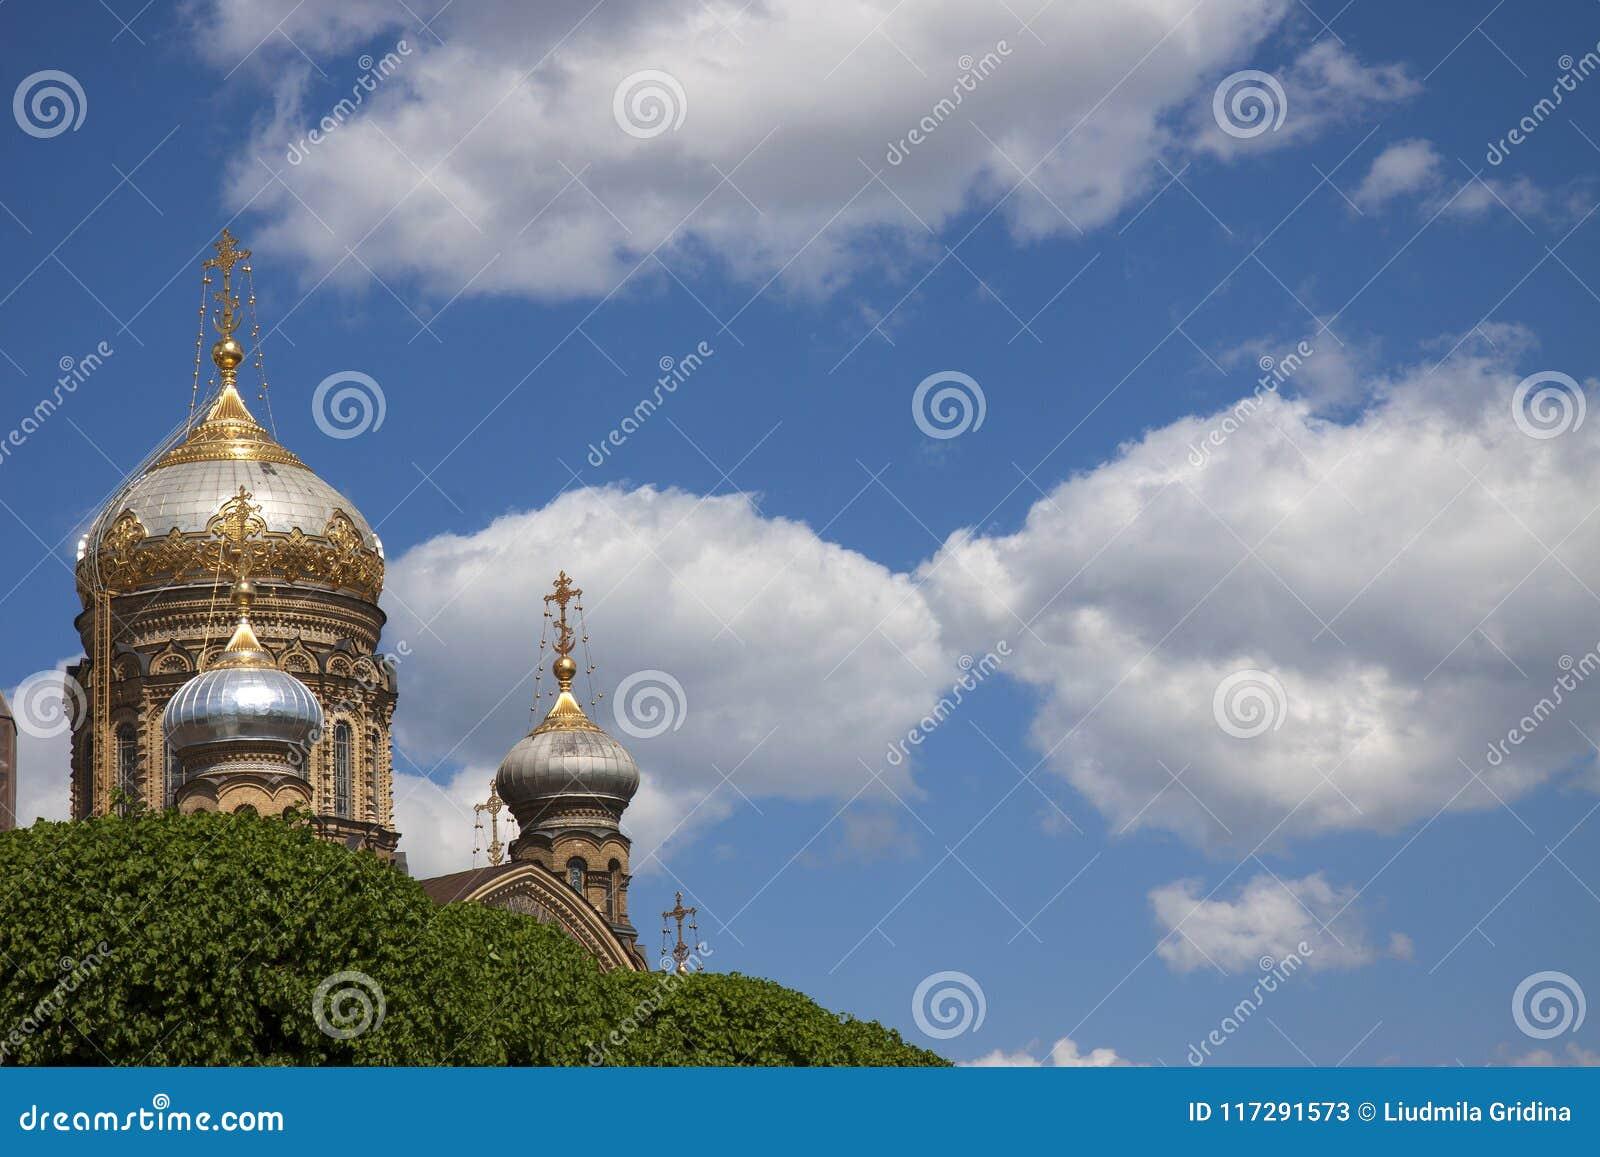 Cathédrale orthodoxe à St Petersburg